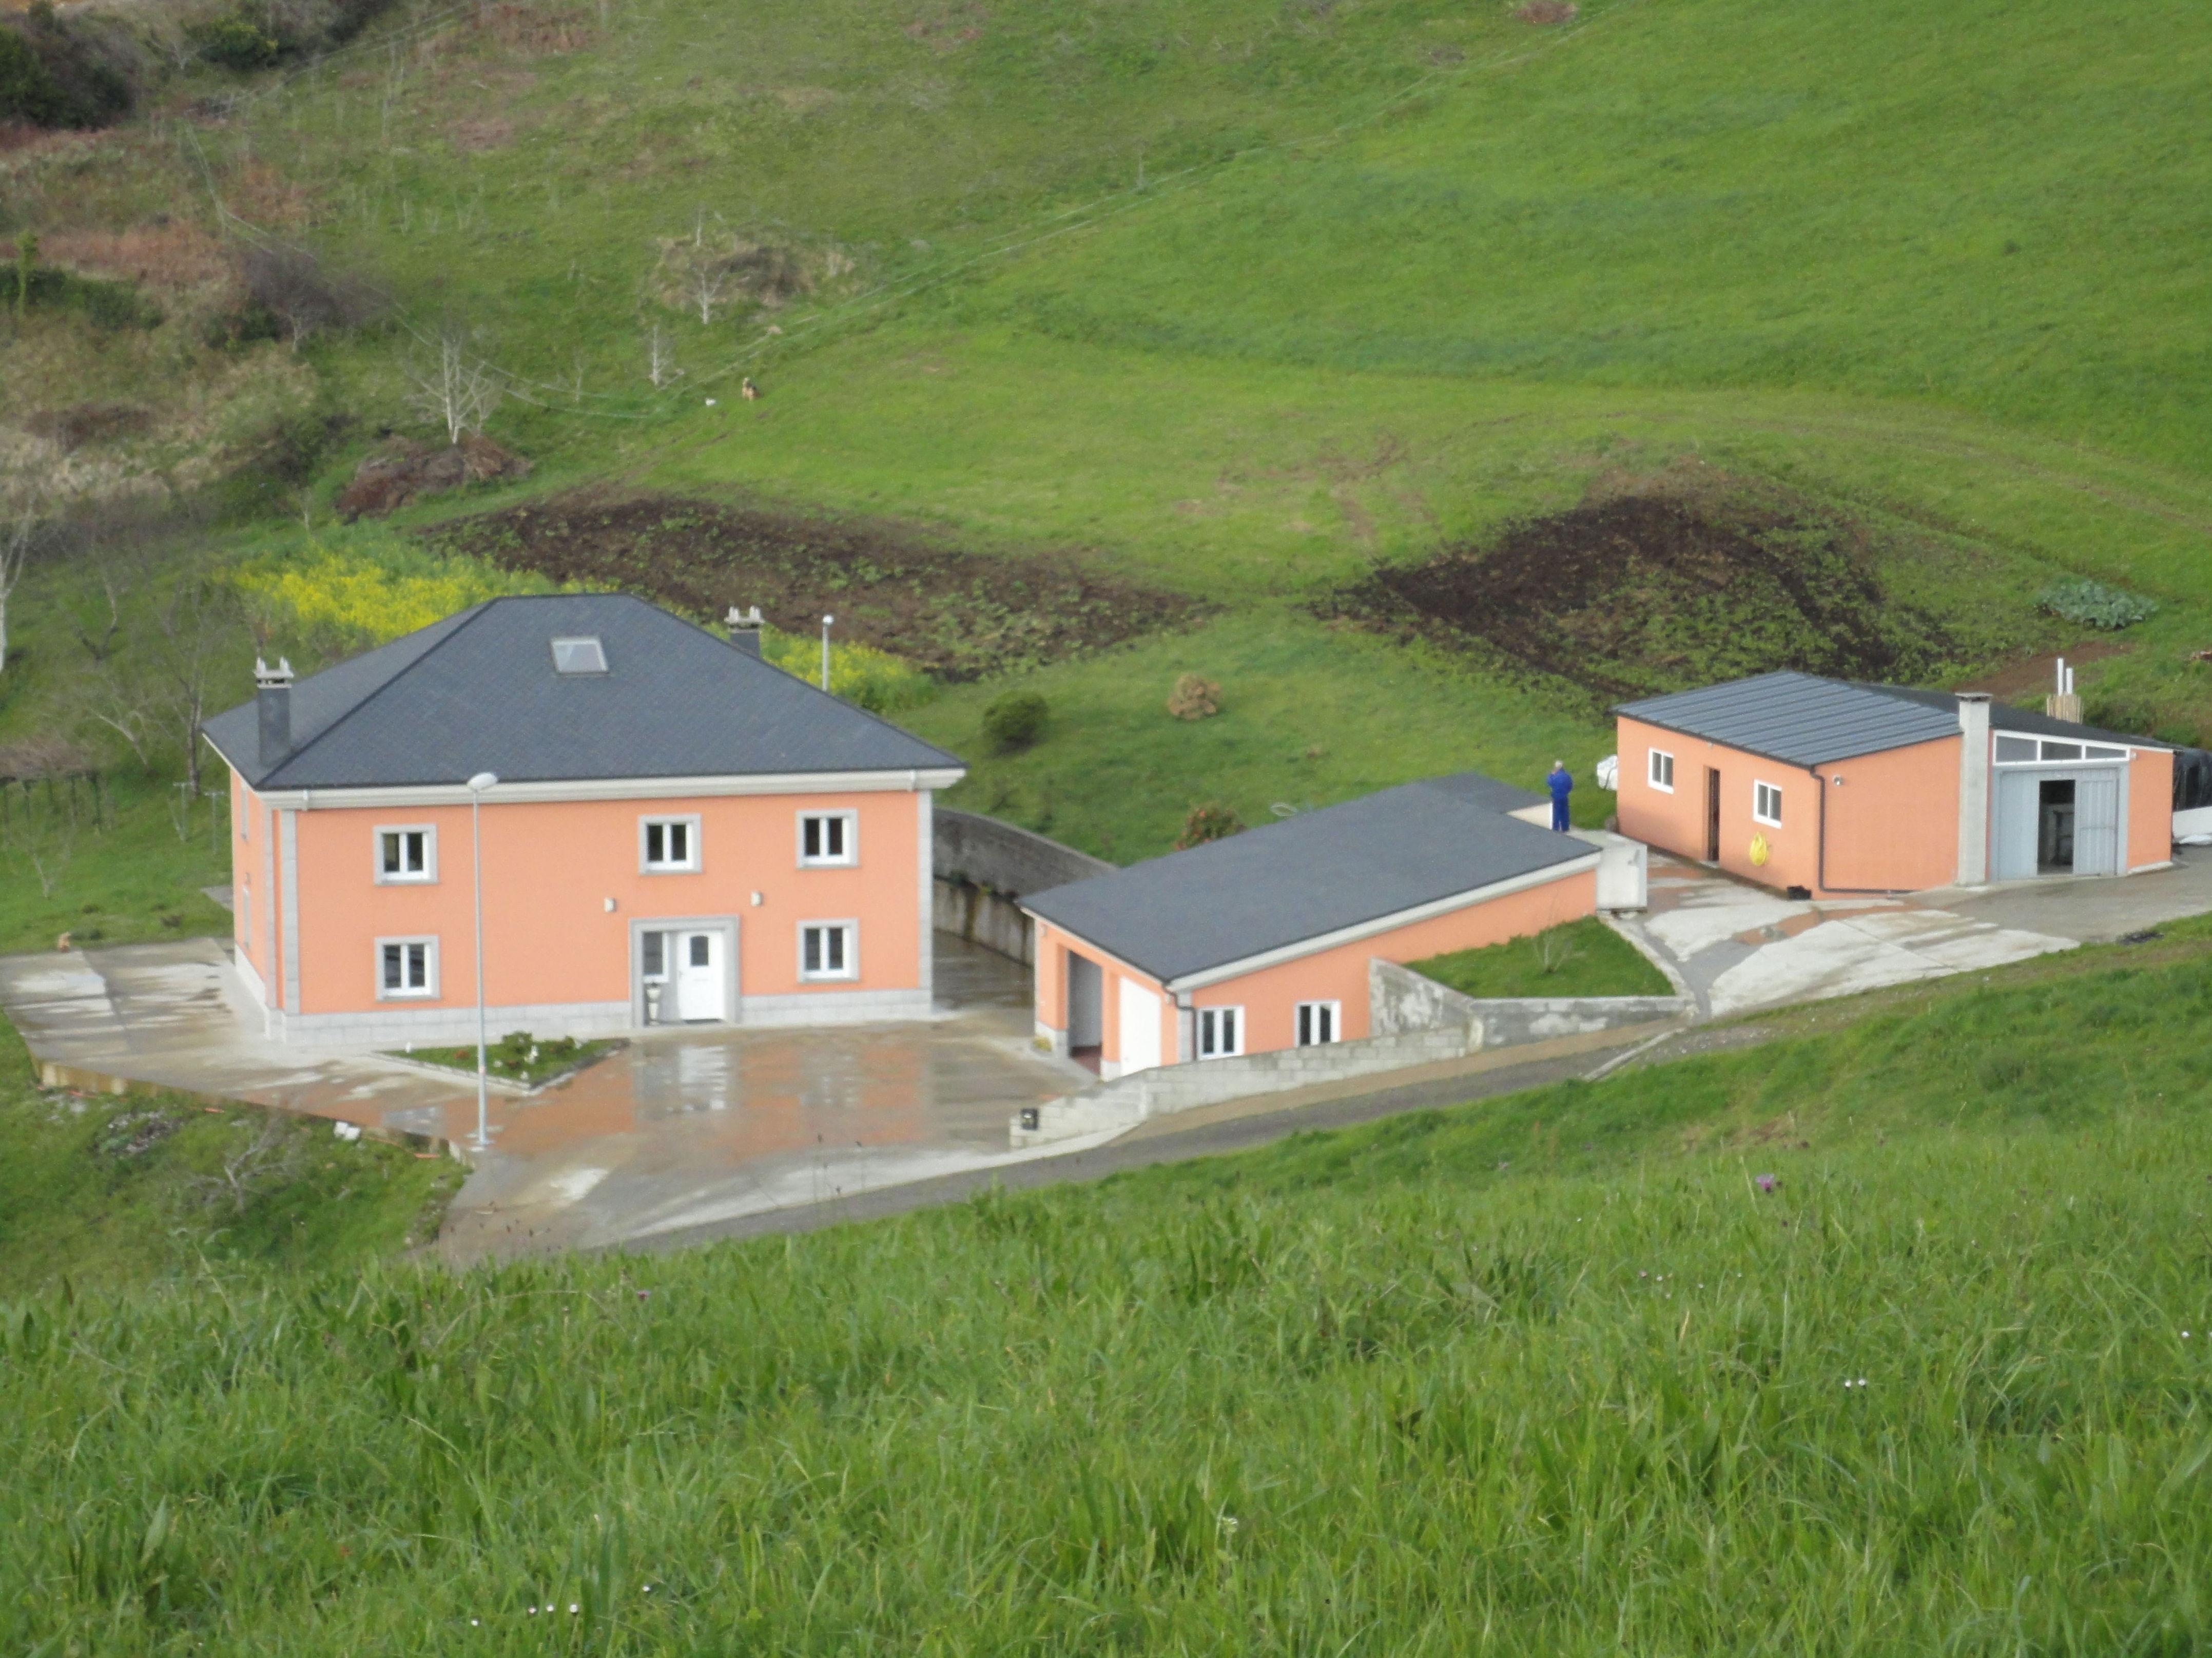 Reforma de viviendas en Lugo